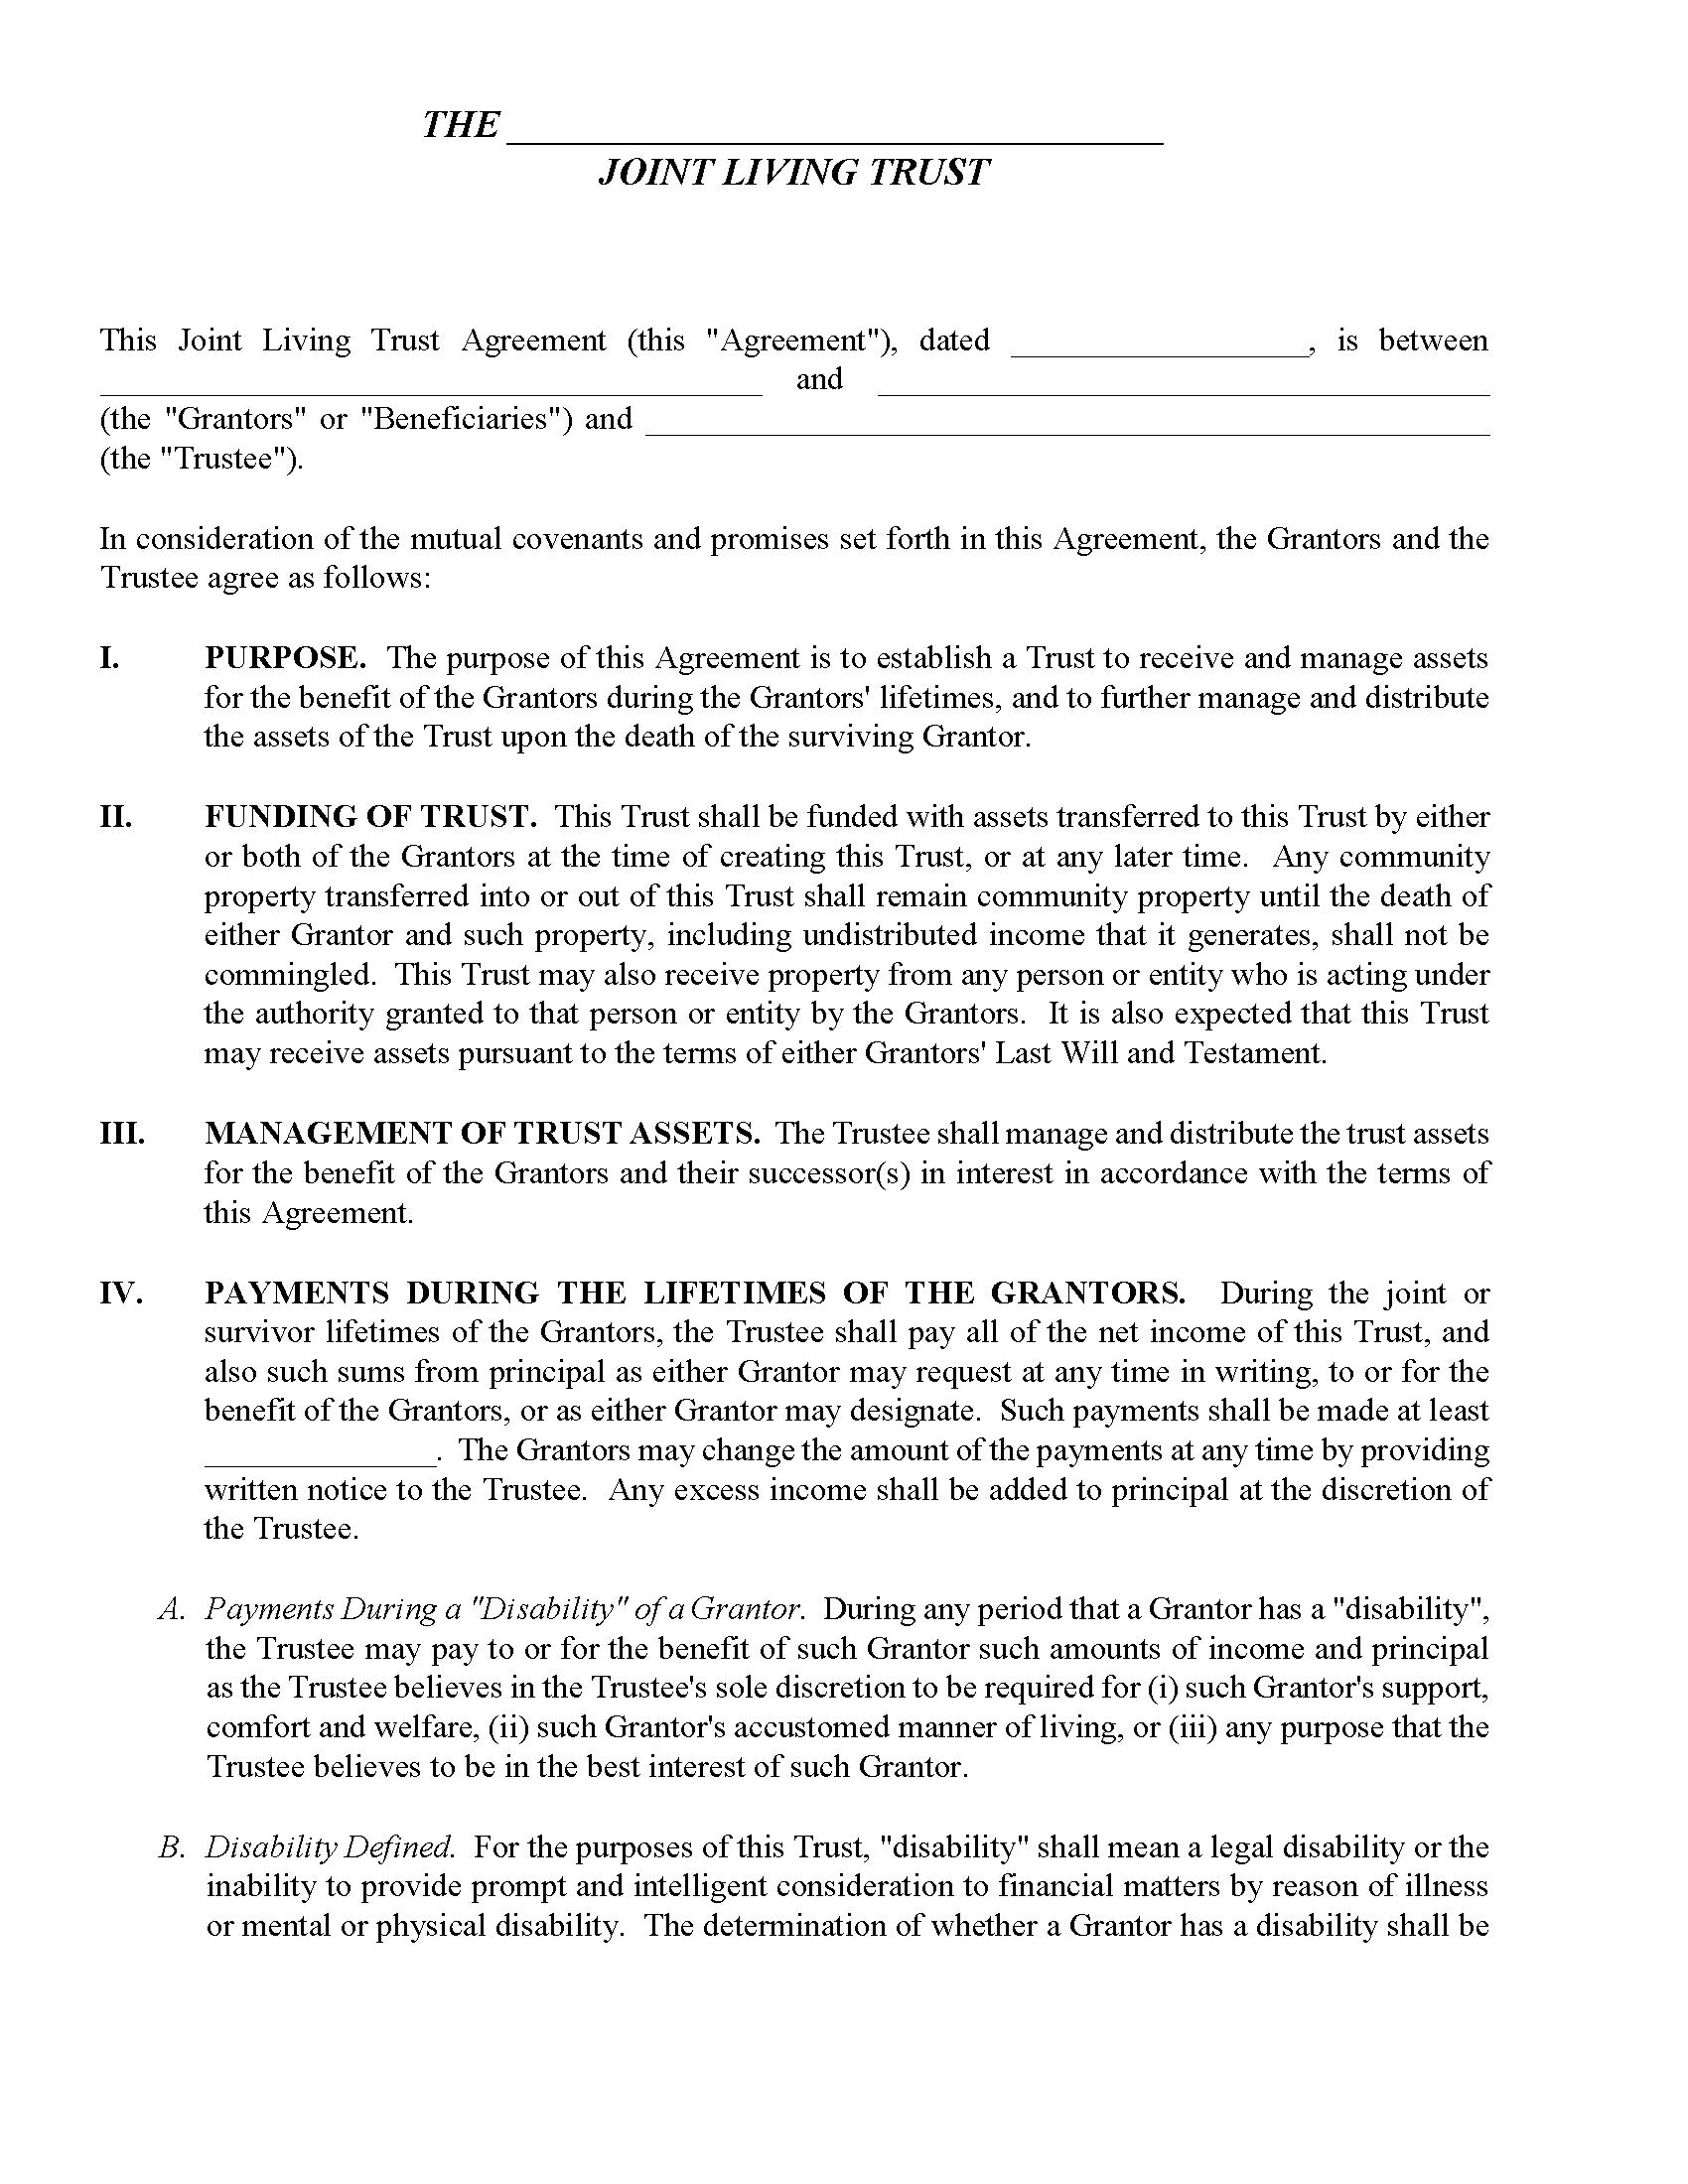 Georgia Joint Living Trust Form